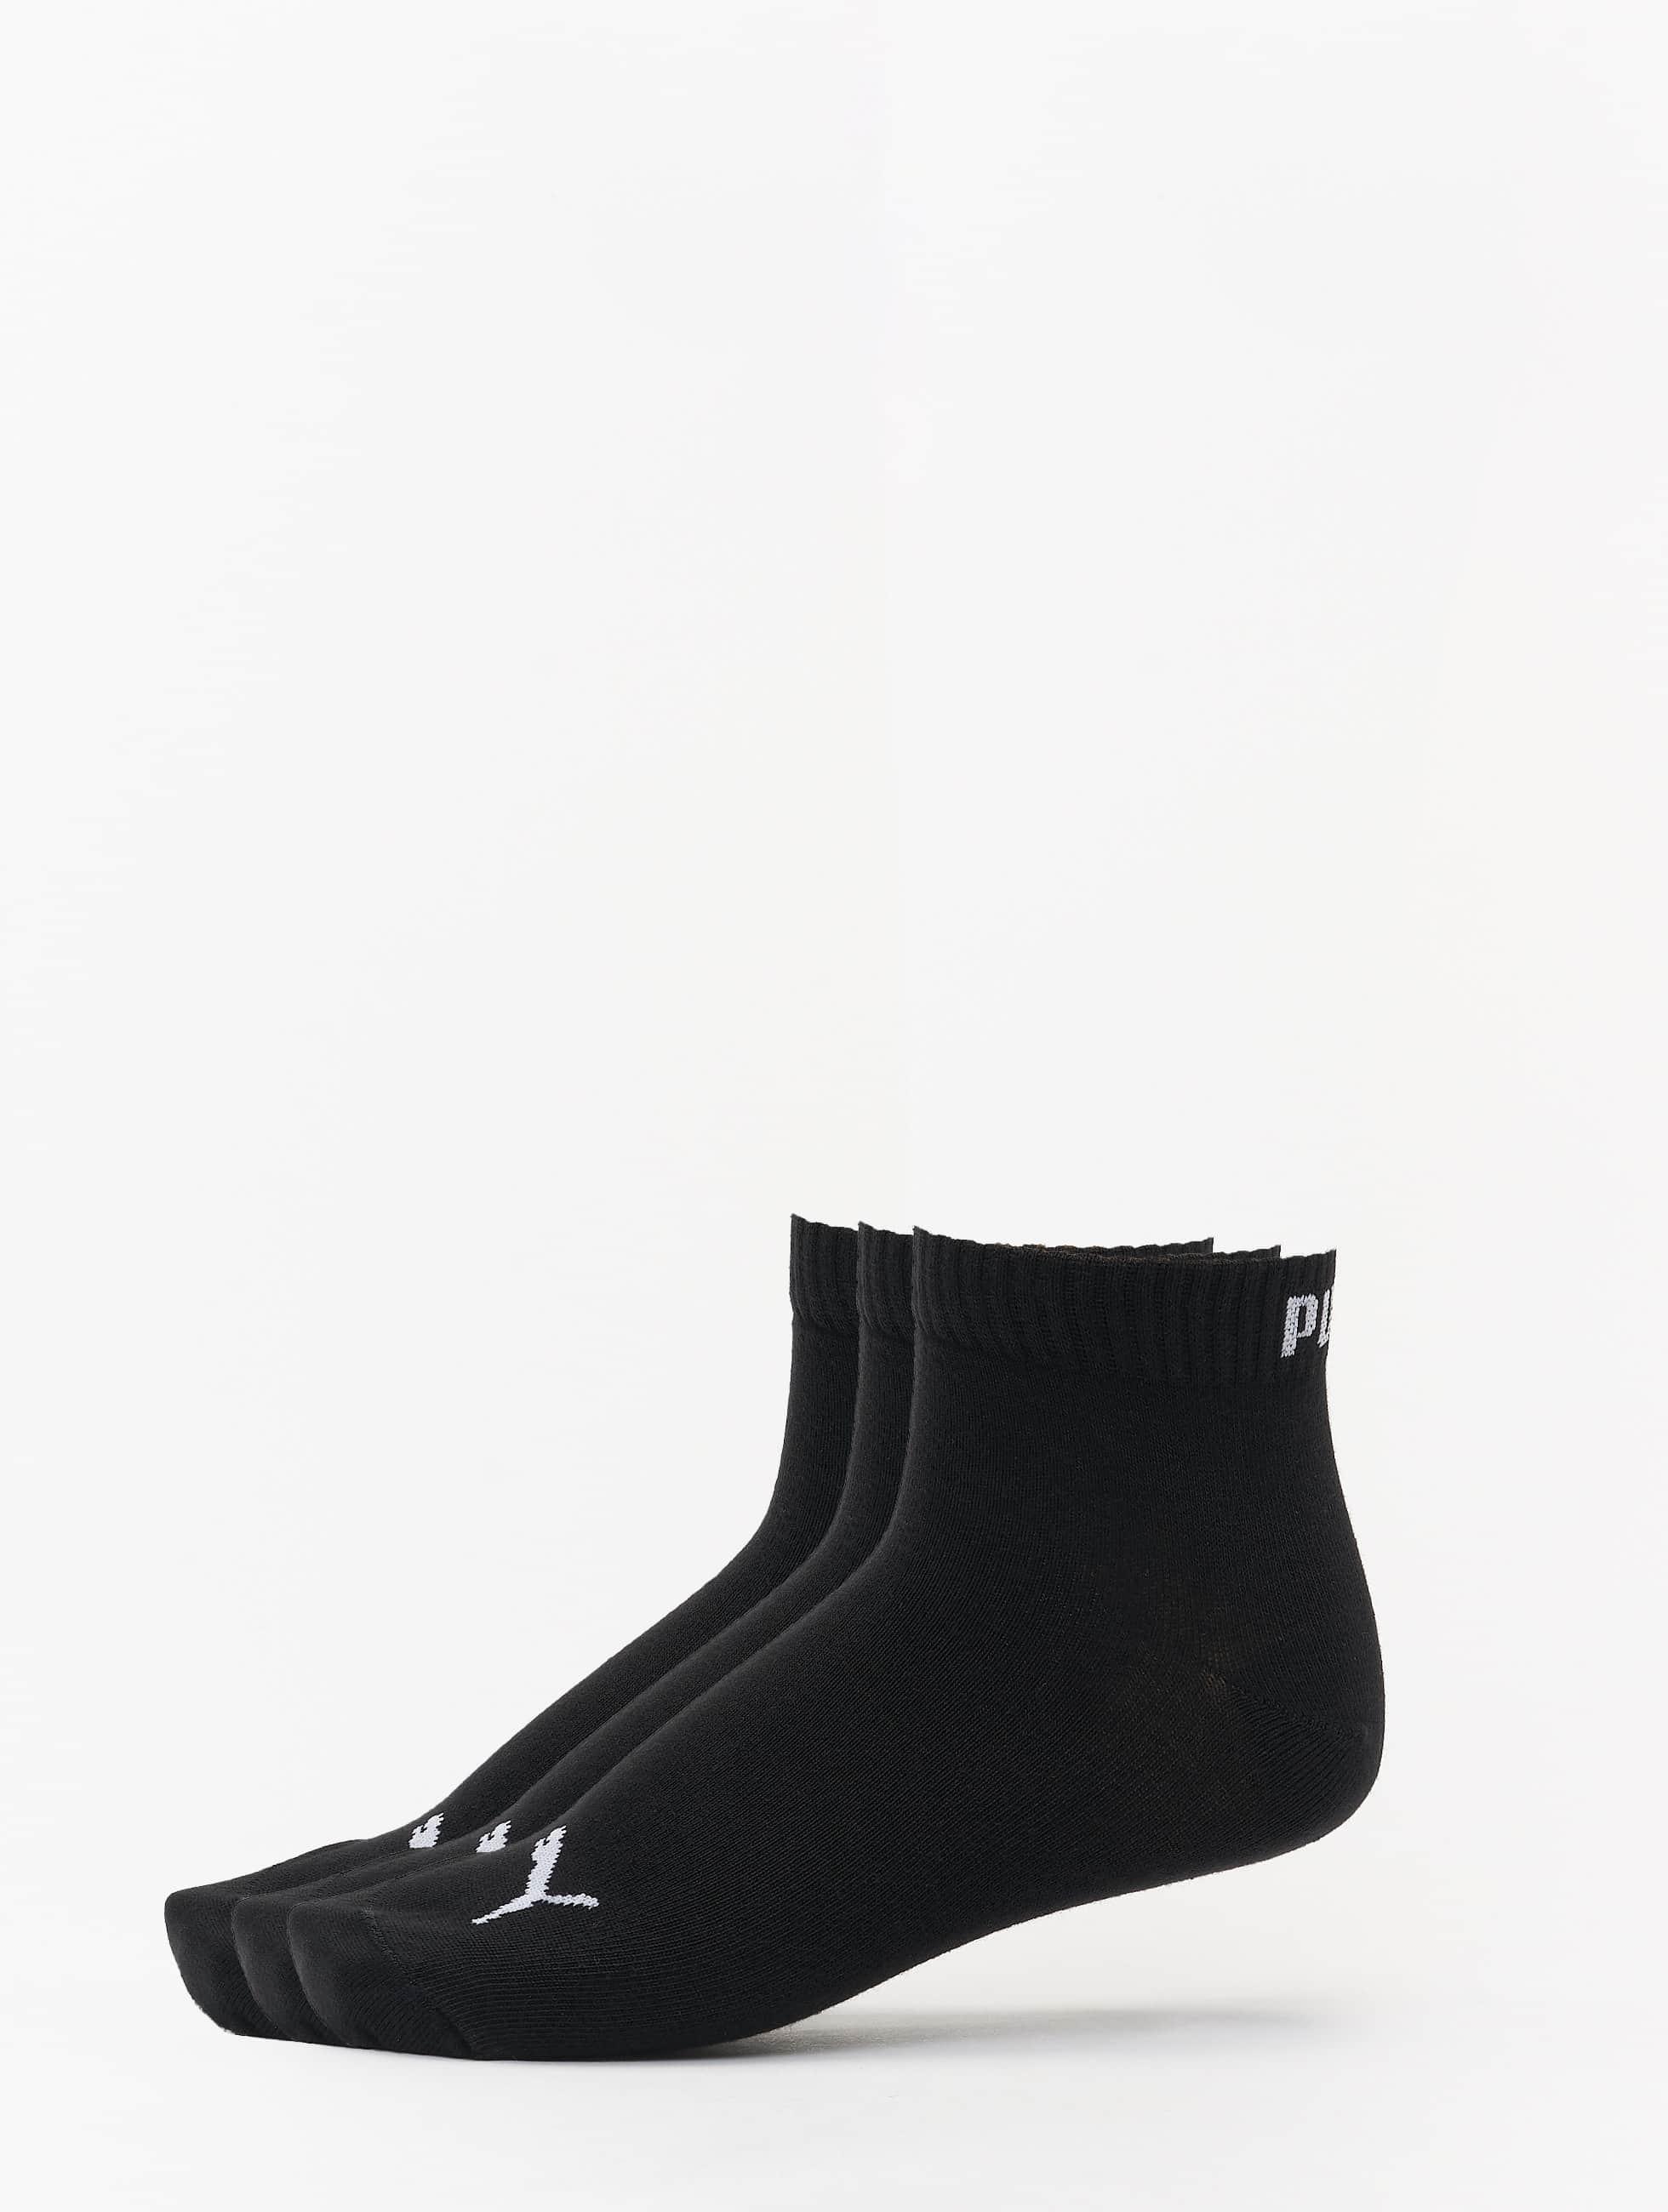 Puma Männer,Frauen Socken 3-Pack Quarters in schwarz